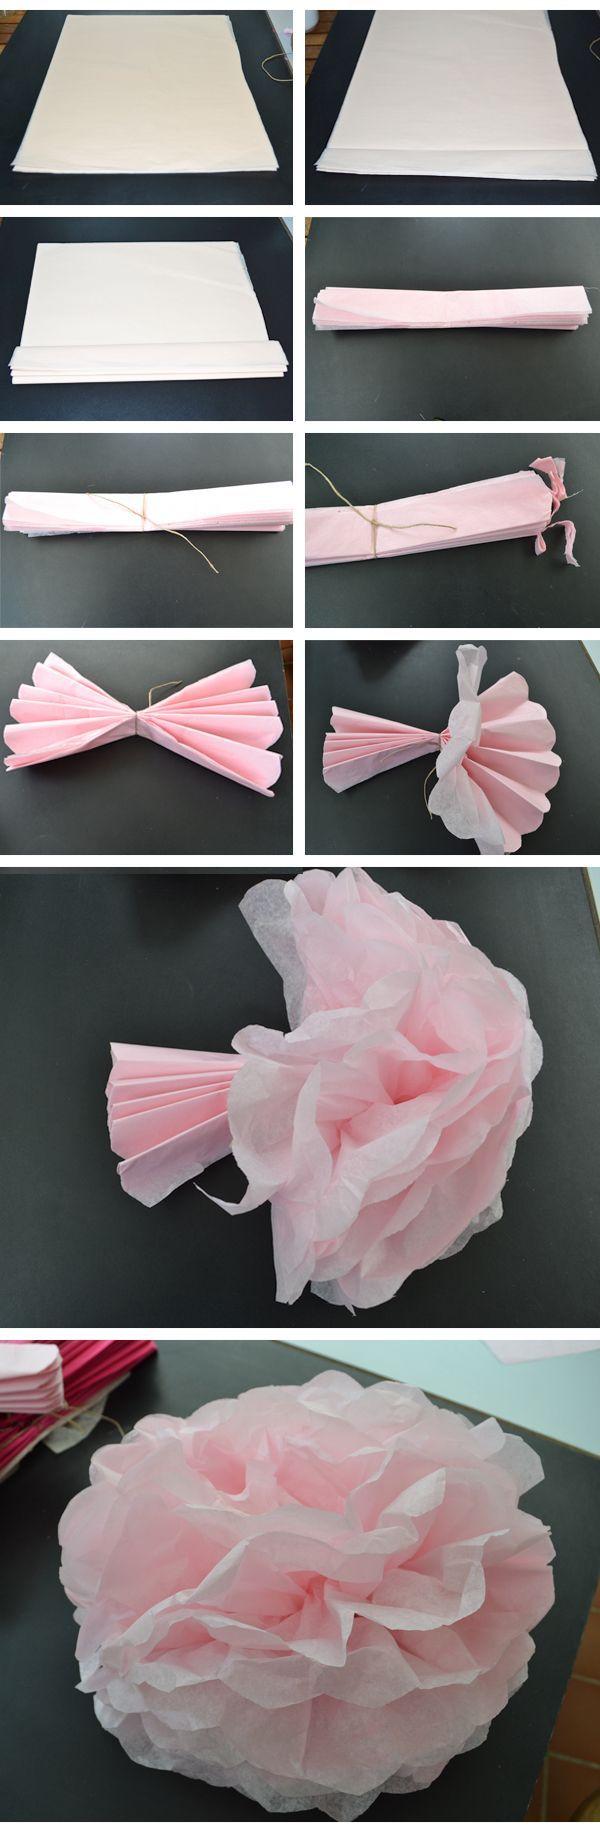 DIY : Pompons de soie | DIY Mariage | Queen For A Day - Blog mariage: